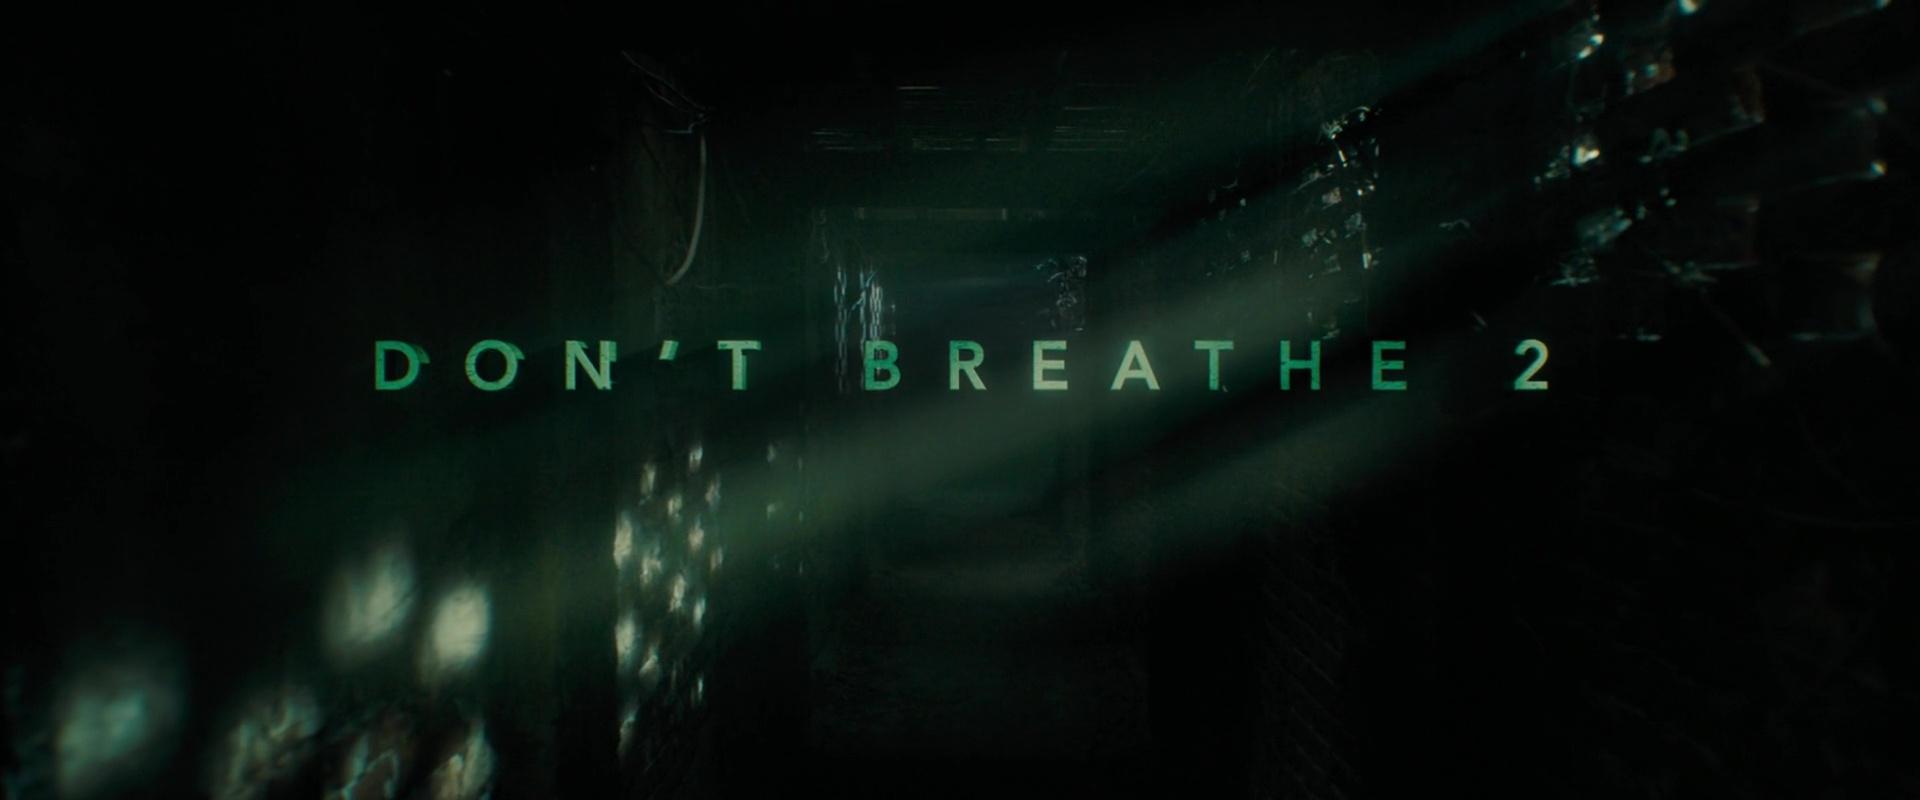 DON'T BREATHE 2 de Rodo Sayagues (2021)